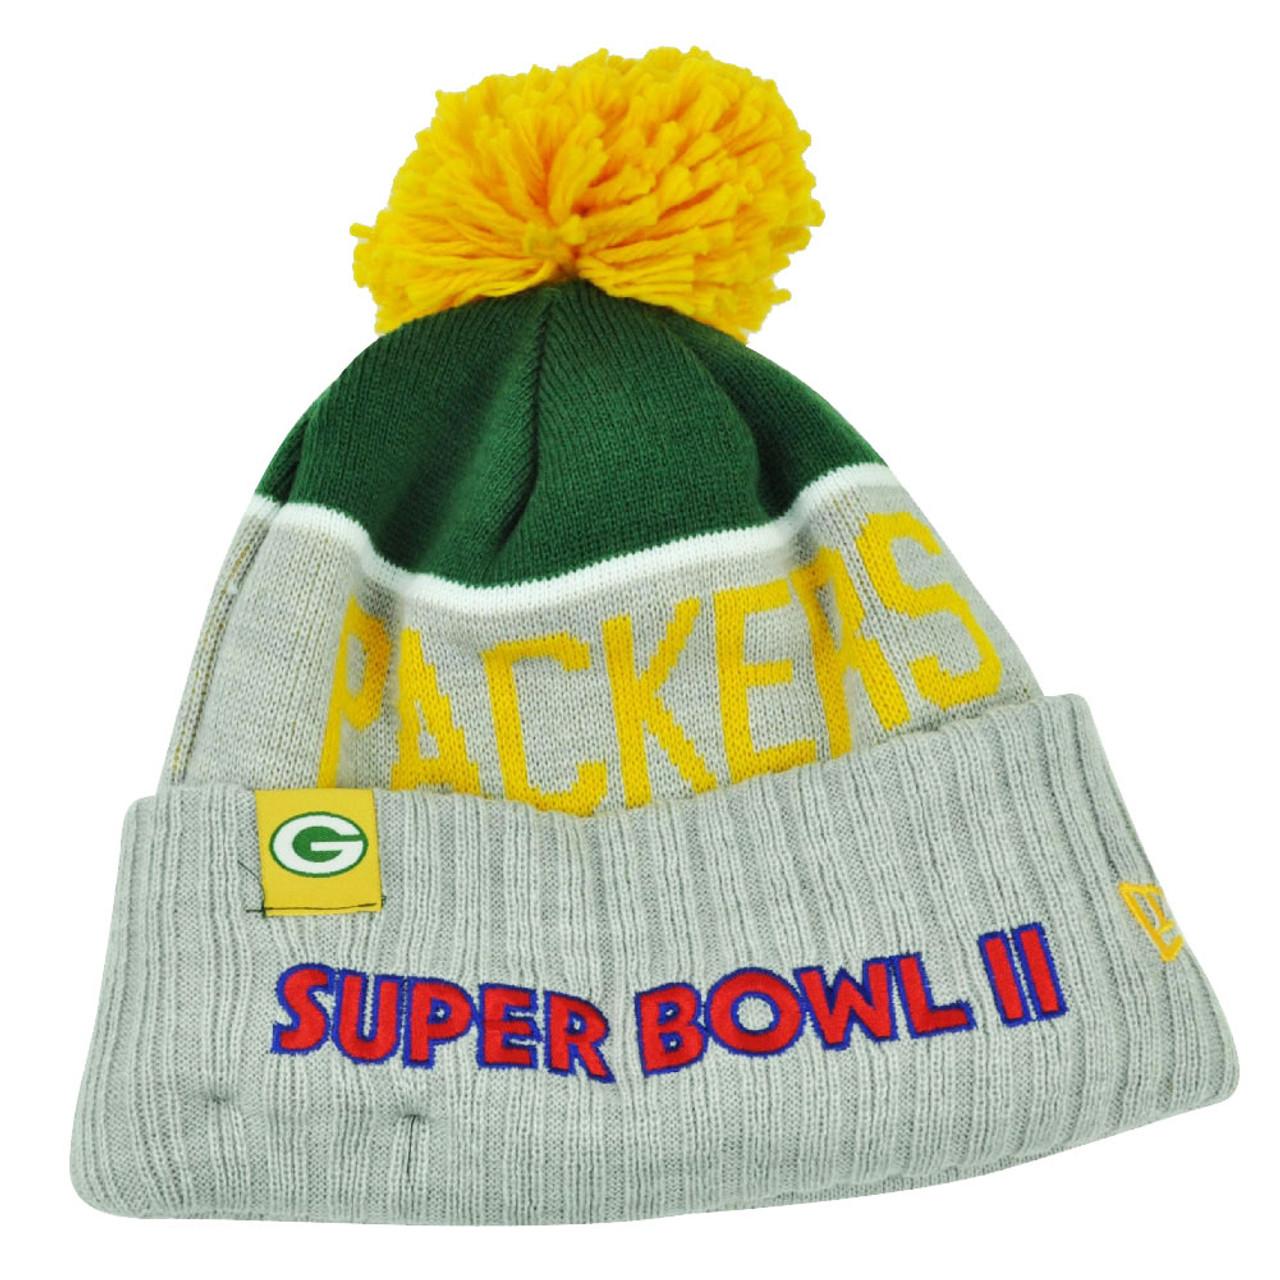 878b6af22c05f7 NFL New Era Super Bowl II Sport Knit Green Bay Packers Knit Beanie Cuffed  Hat - Cap Store Online.com